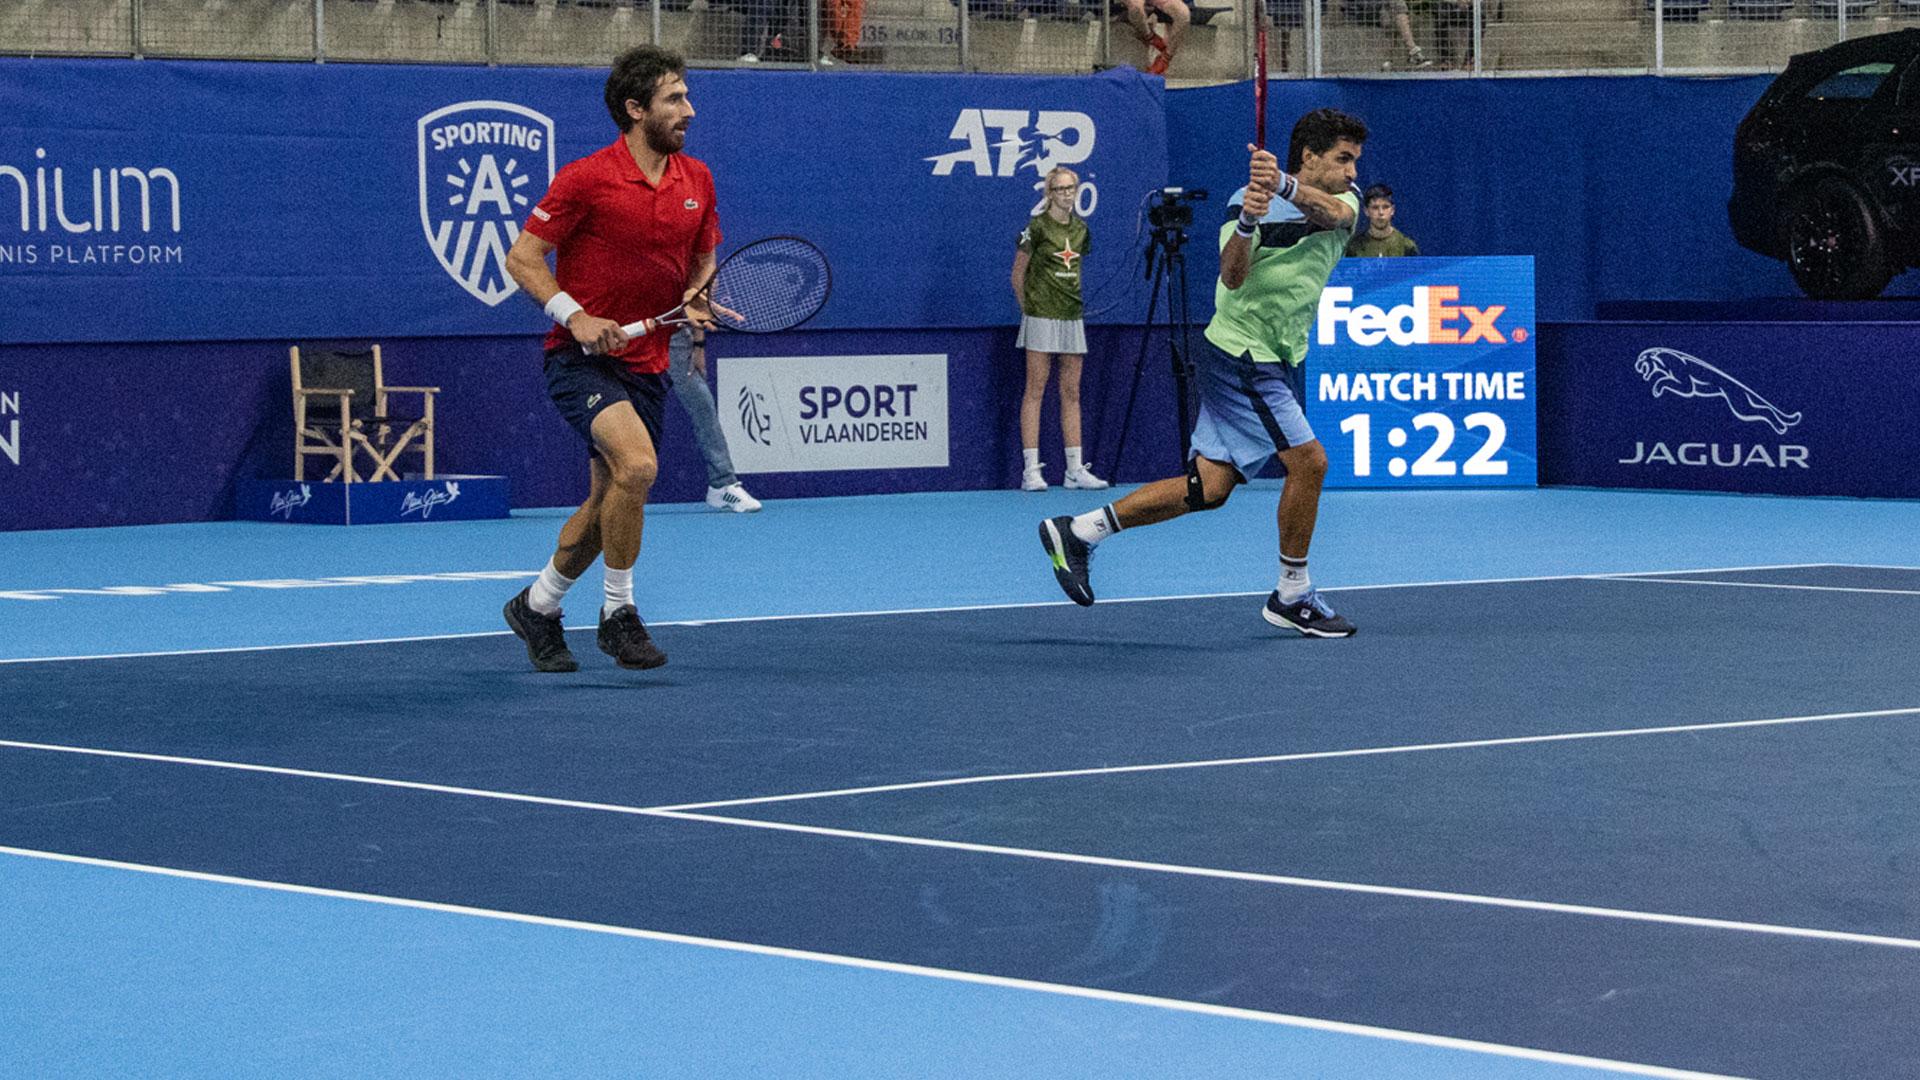 Foto: ATP Tour